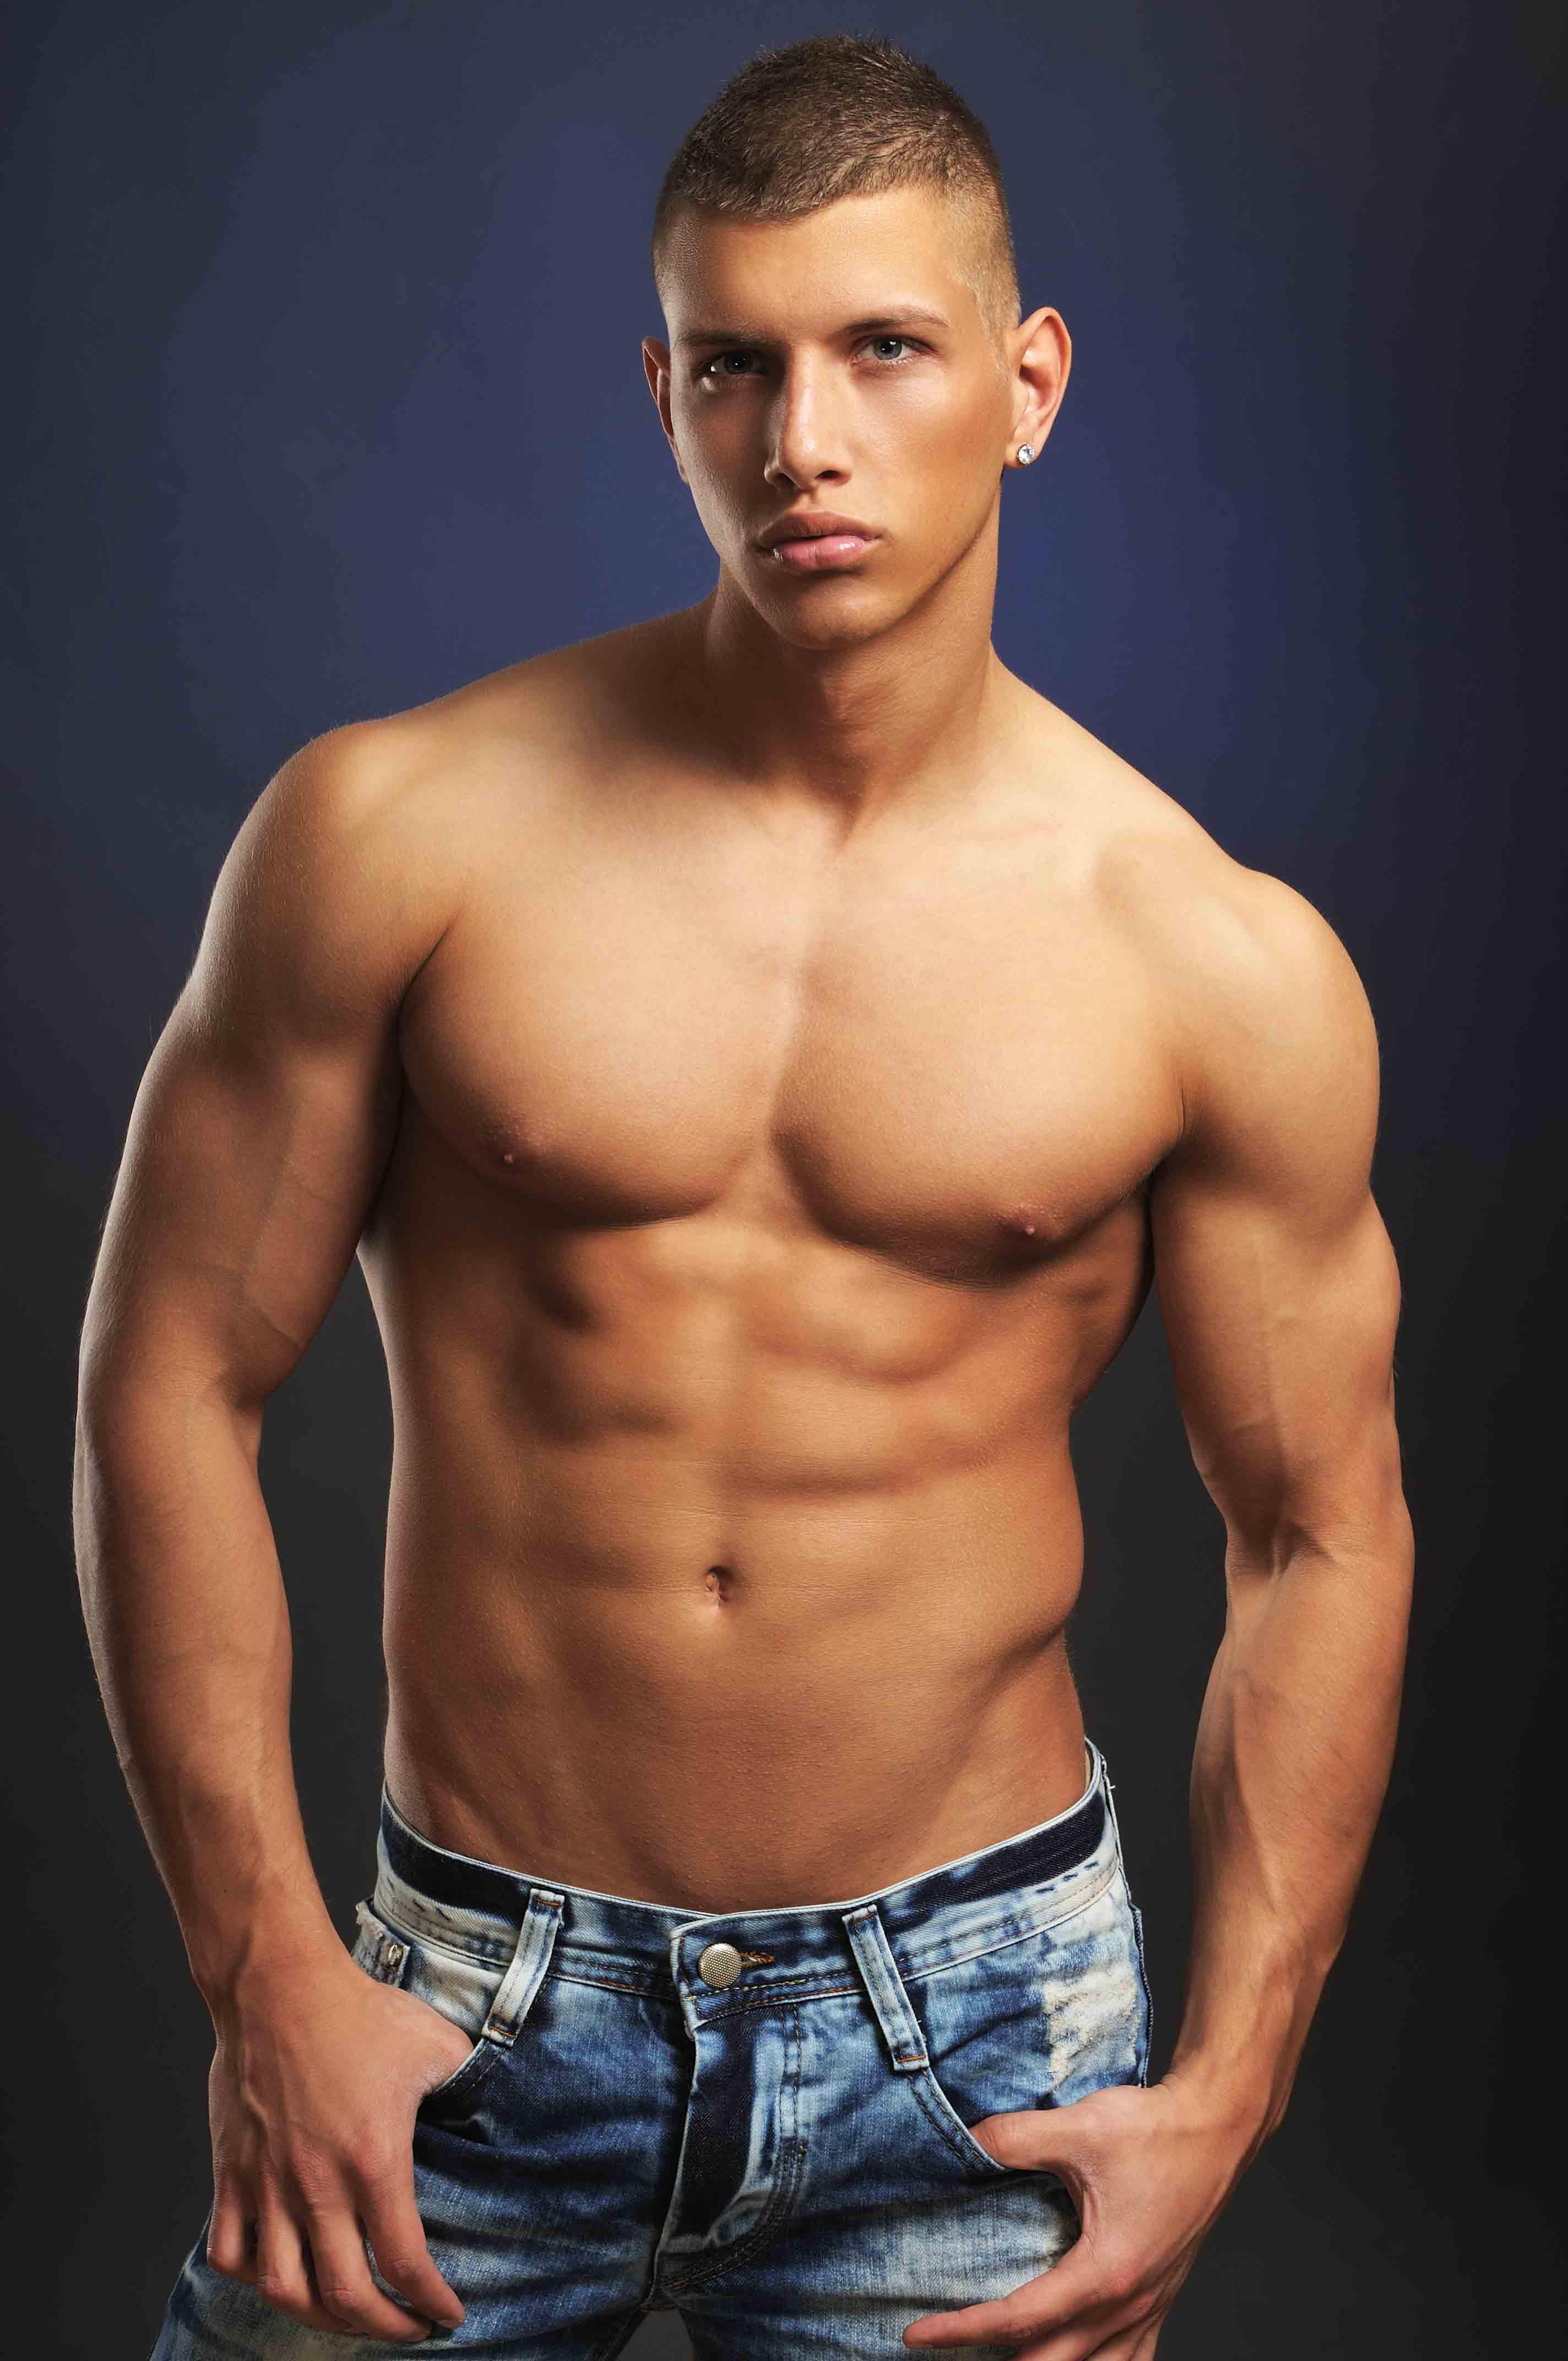 Male Strippers in Brisbane | Hire Male Strippers | Men of